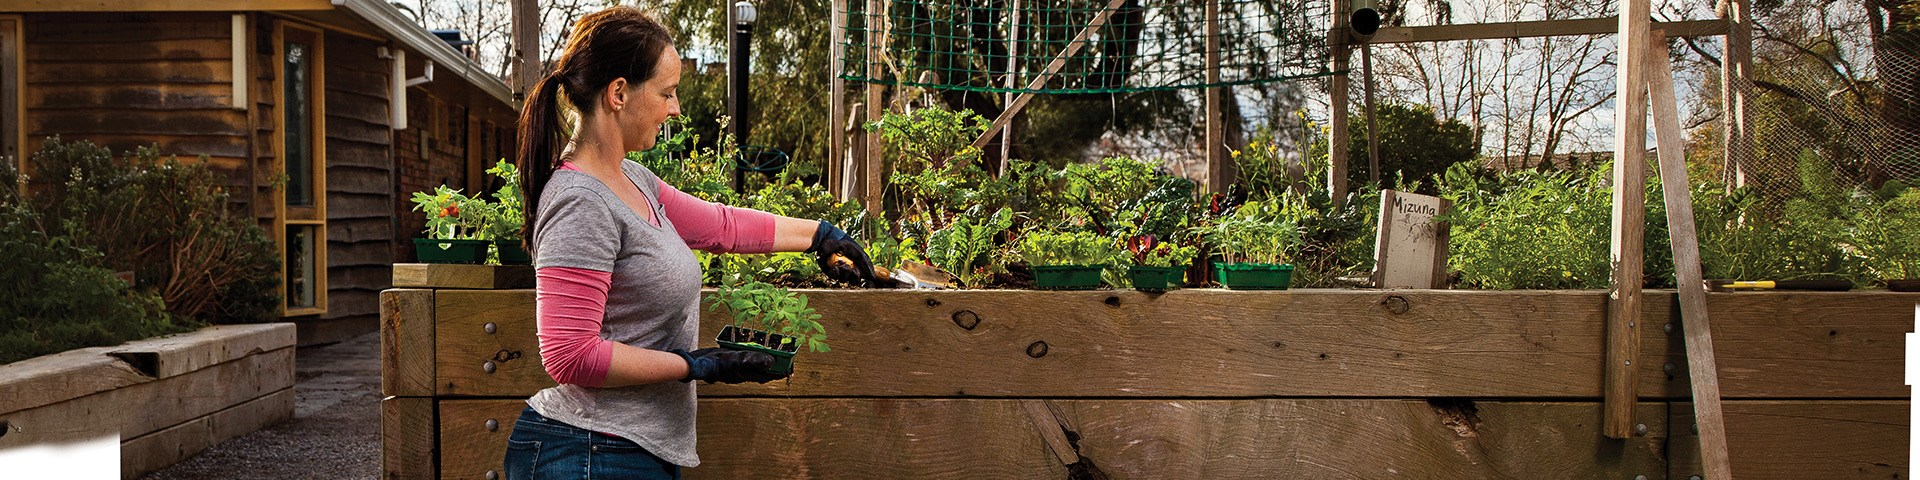 DIY Vegetable Garden Box